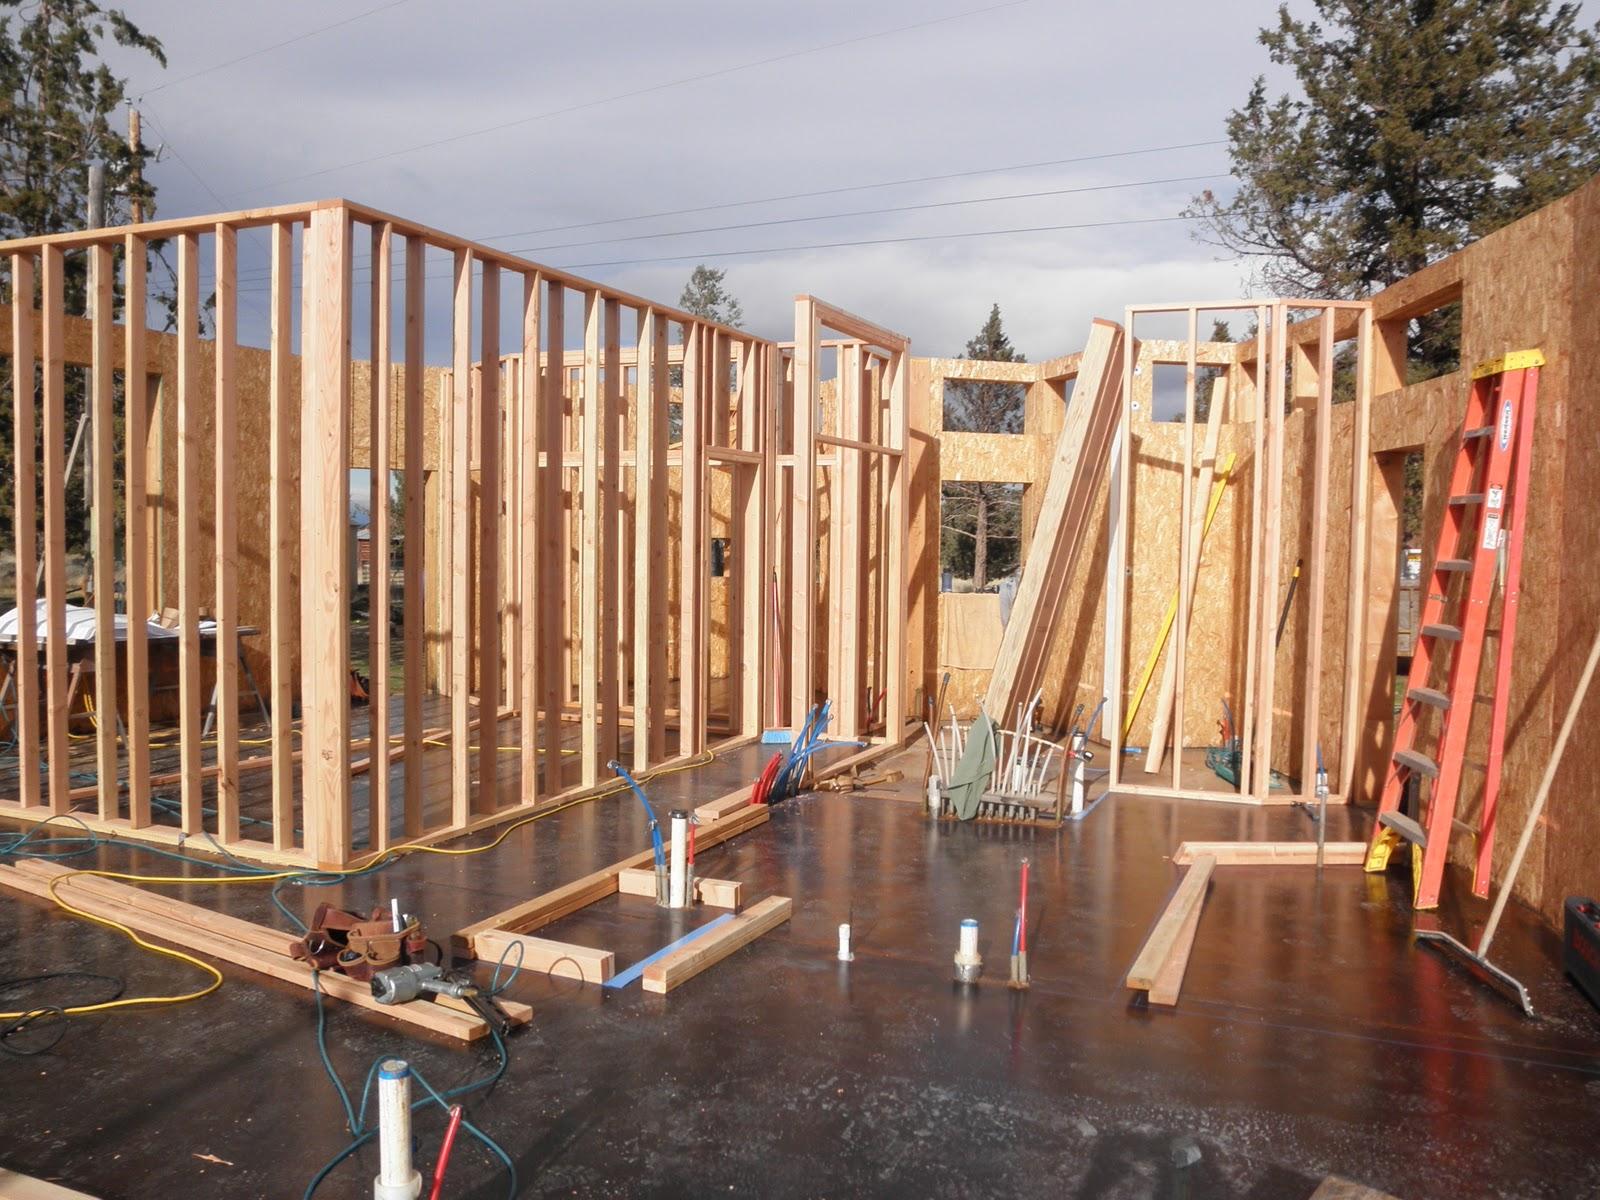 2x6 Wall Construction : Roundup ranch nov framed double block walls